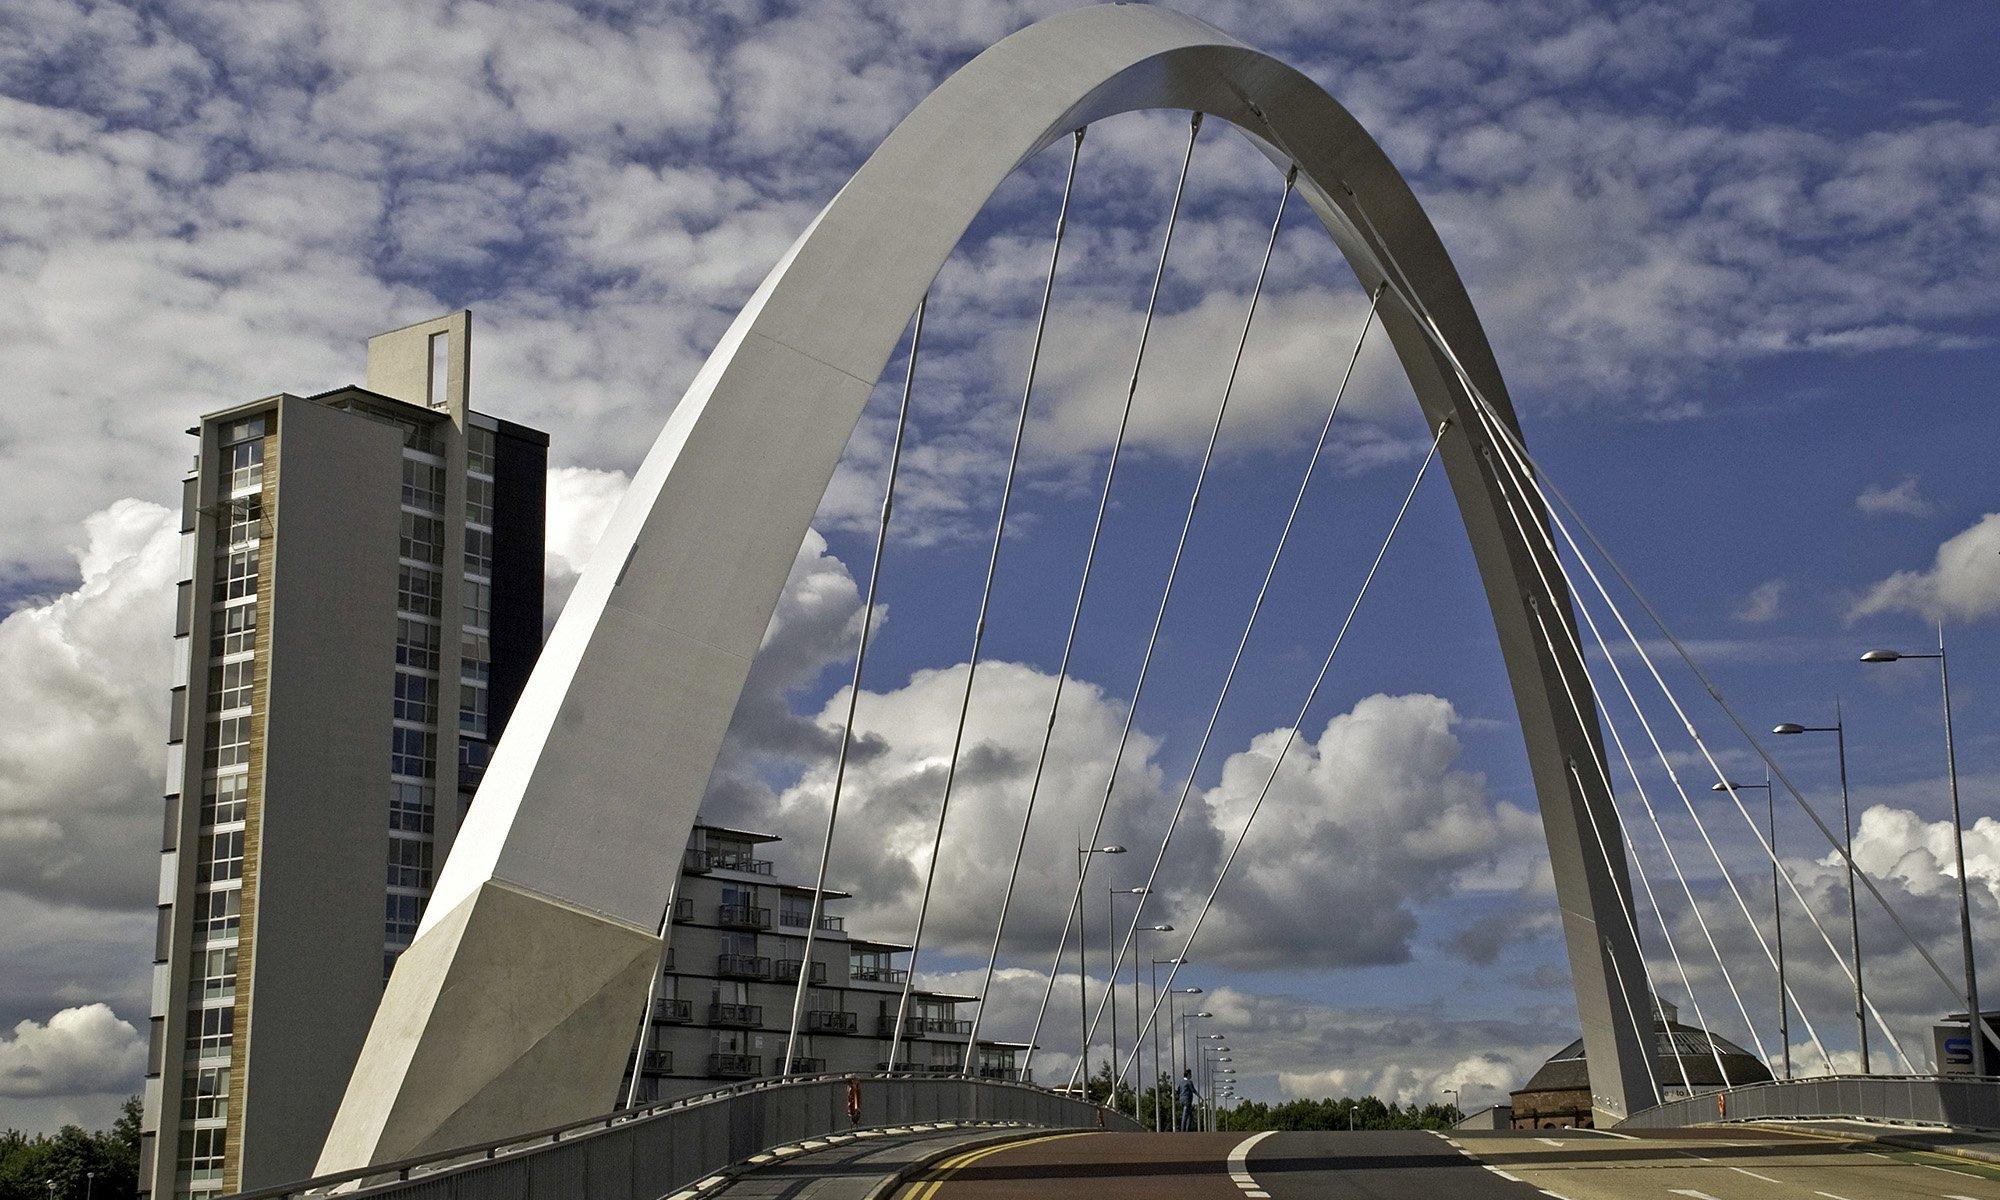 Clyde Arc bridge in Glasgow - Ed O'Keeffe Photography